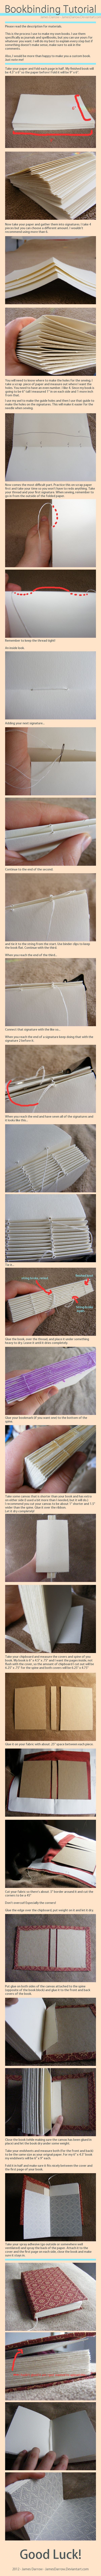 Bookbinding tutorial. love making homemade books!